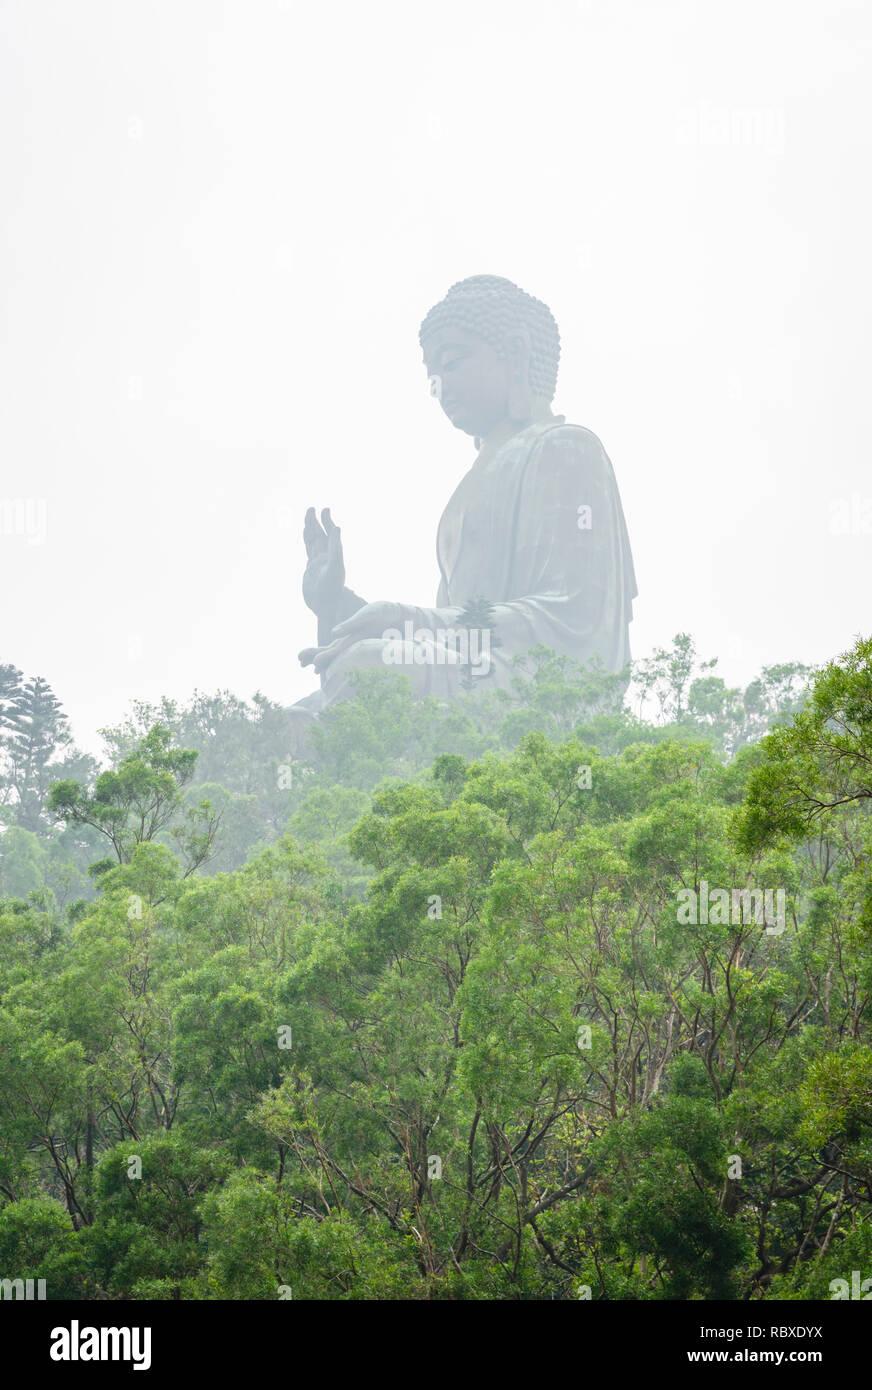 Haze covered Tian Tan Buddha above the tree line, Ngong Ping, Lantau Island, Hong Kong - Stock Image